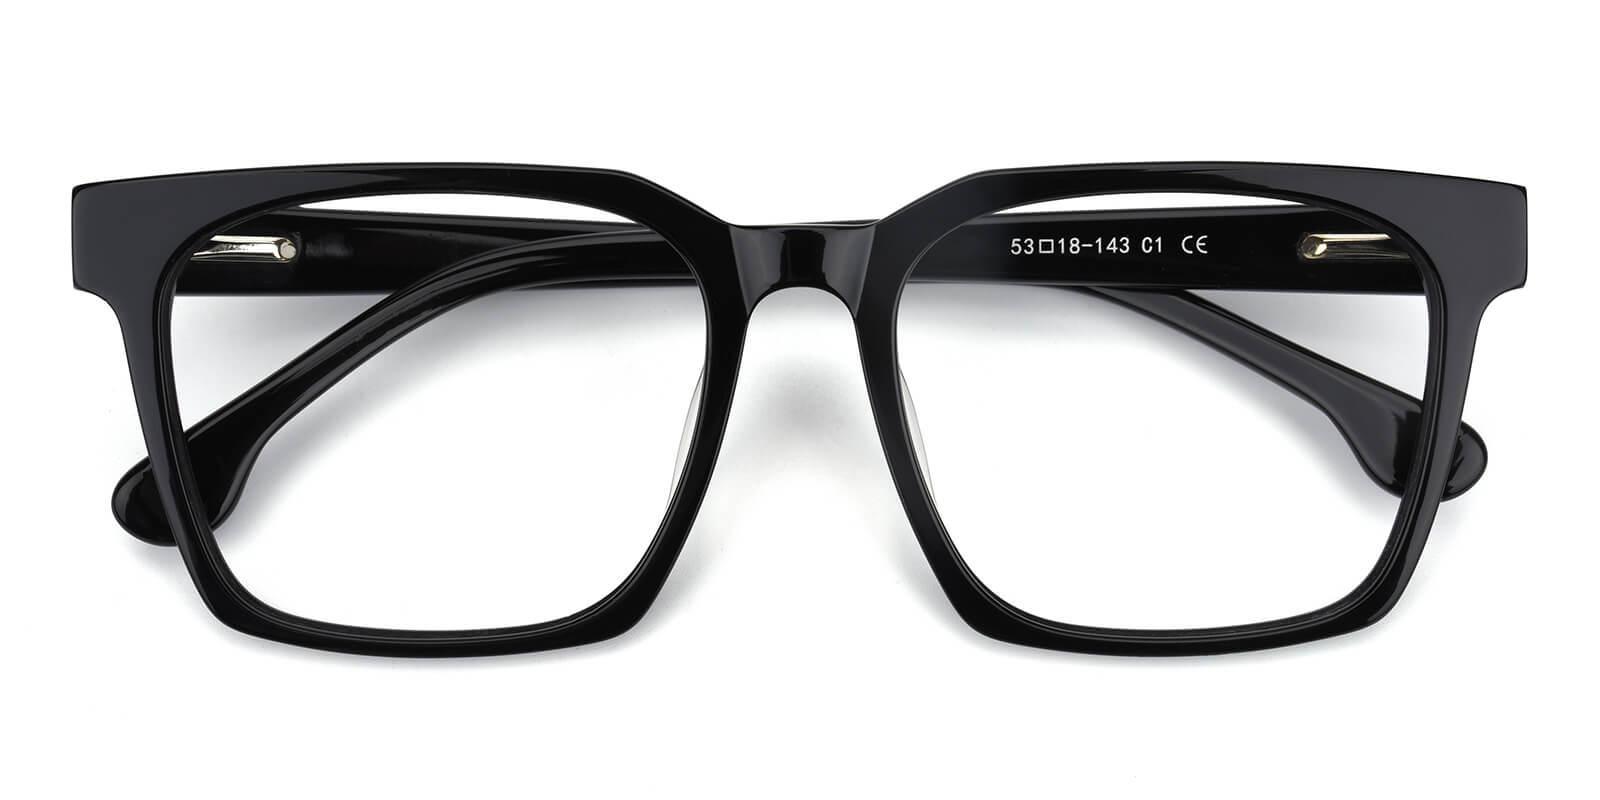 Trapezoid-Black-Square-Acetate-Eyeglasses-detail